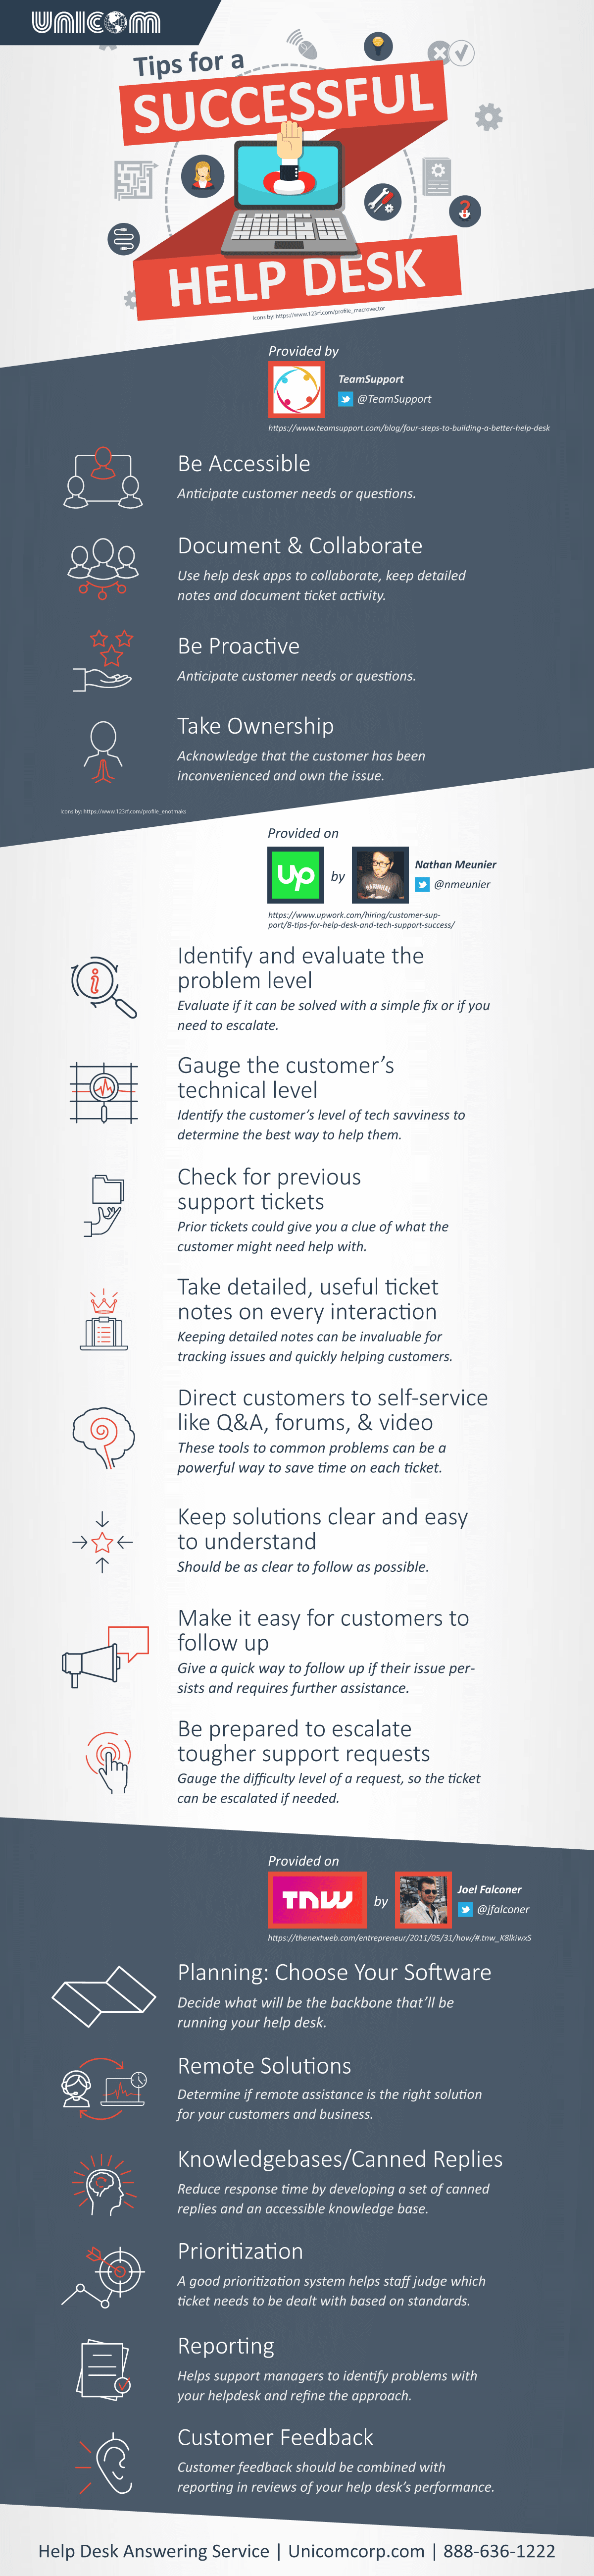 successful help desk infographic